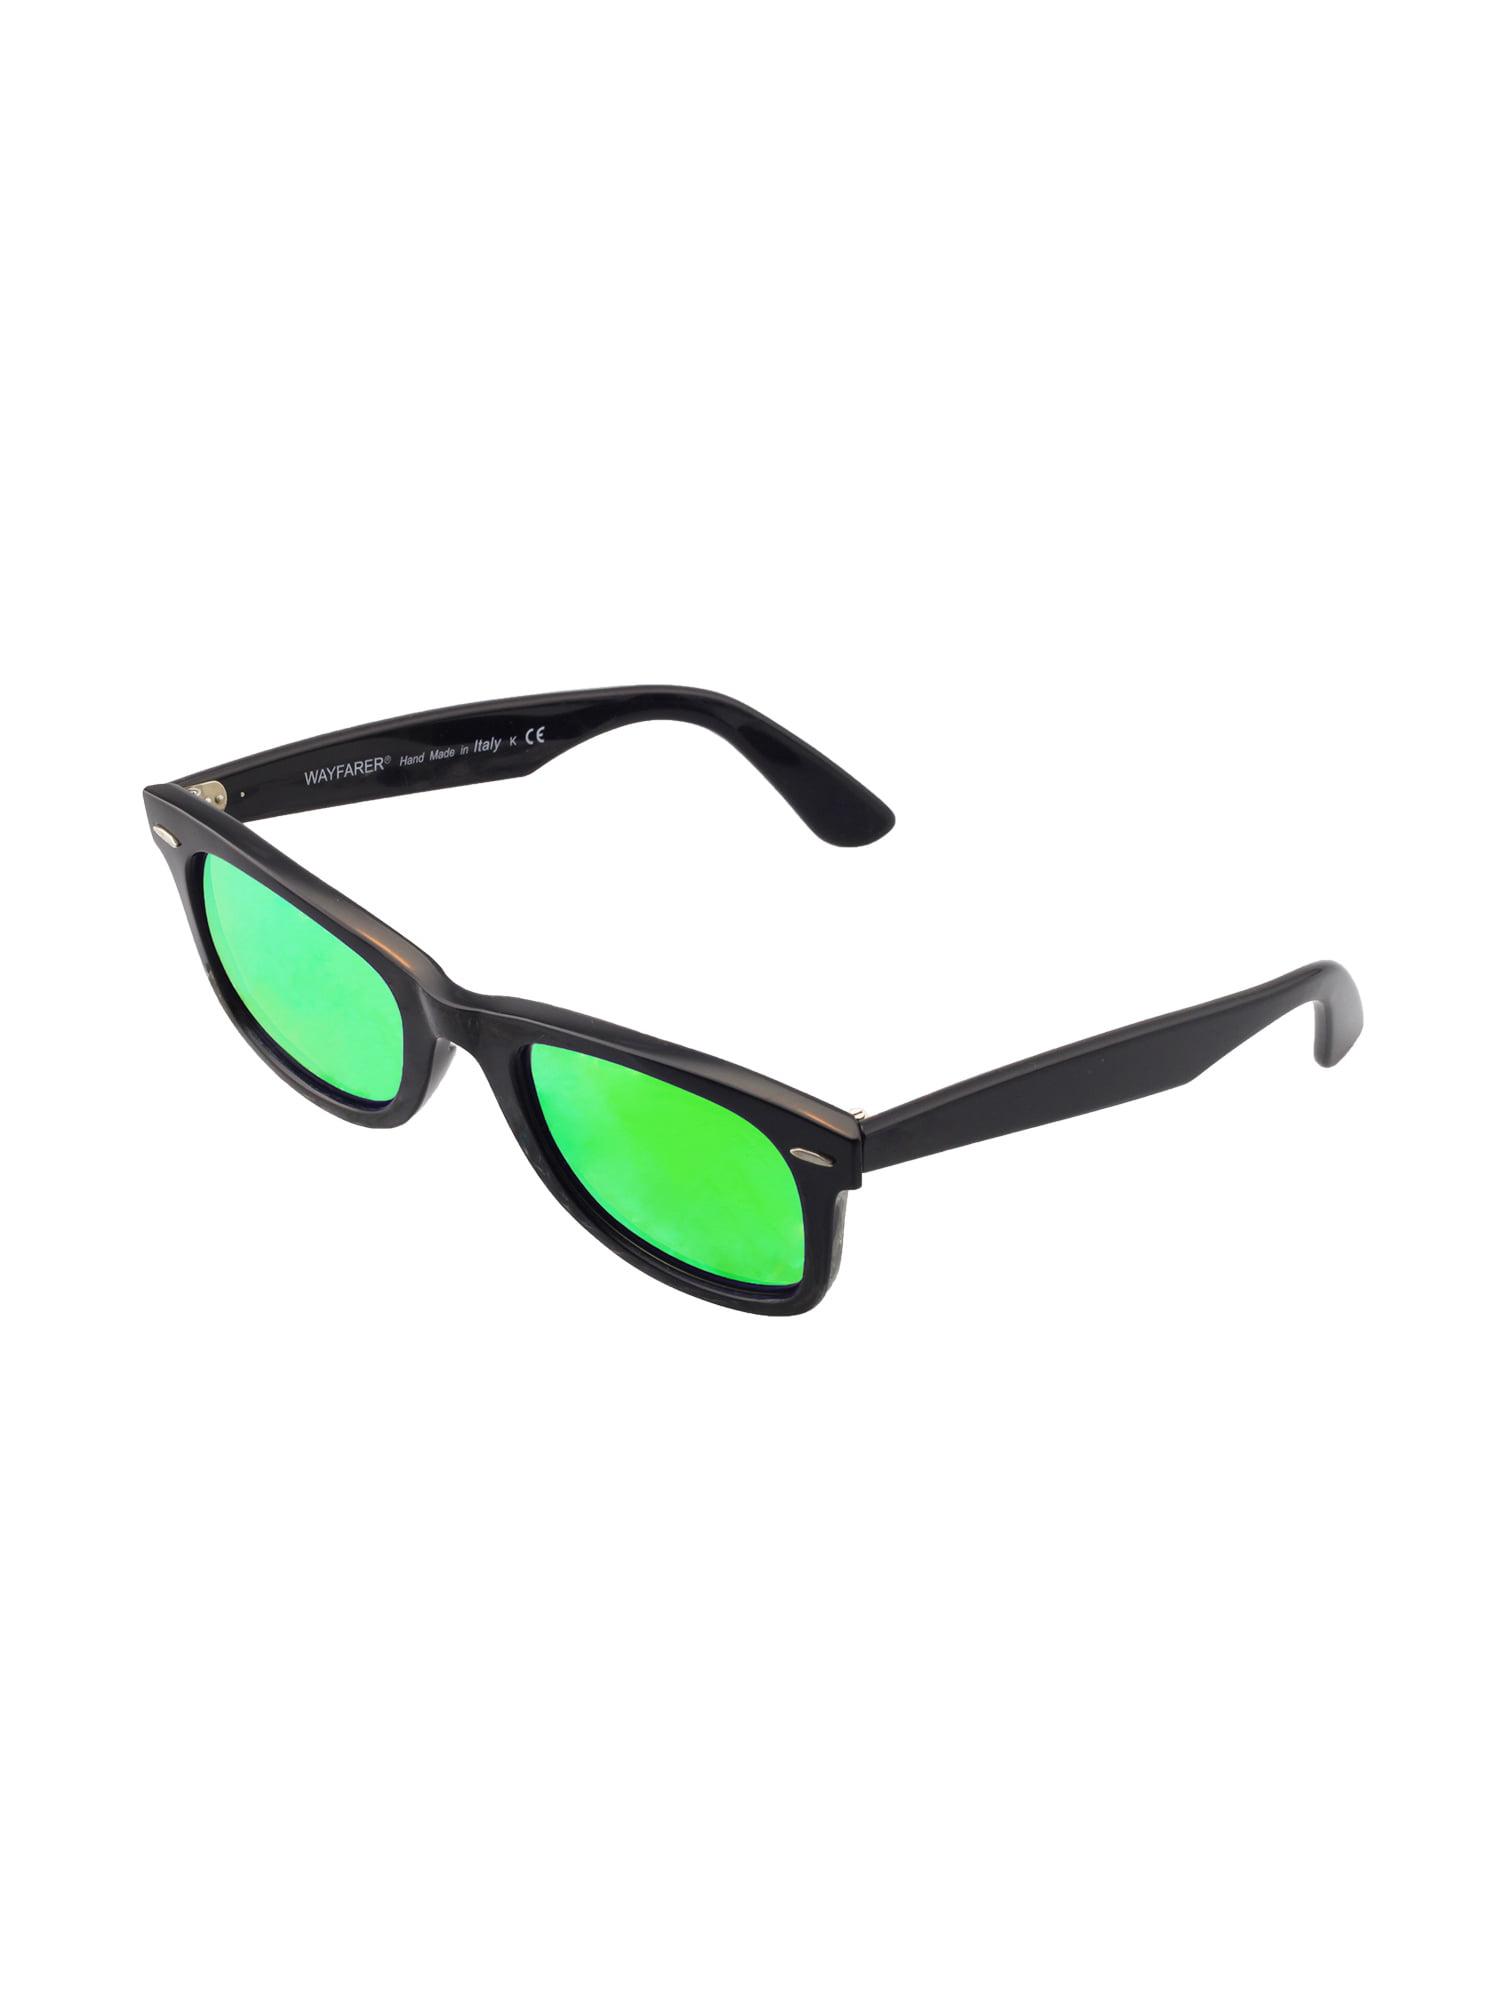 45bdc82ccd Walleva - Walleva Brown Polarized Replacement Lenses for Ray-Ban Wayfarer  RB2140 50mm Sunglasses - Walmart.com